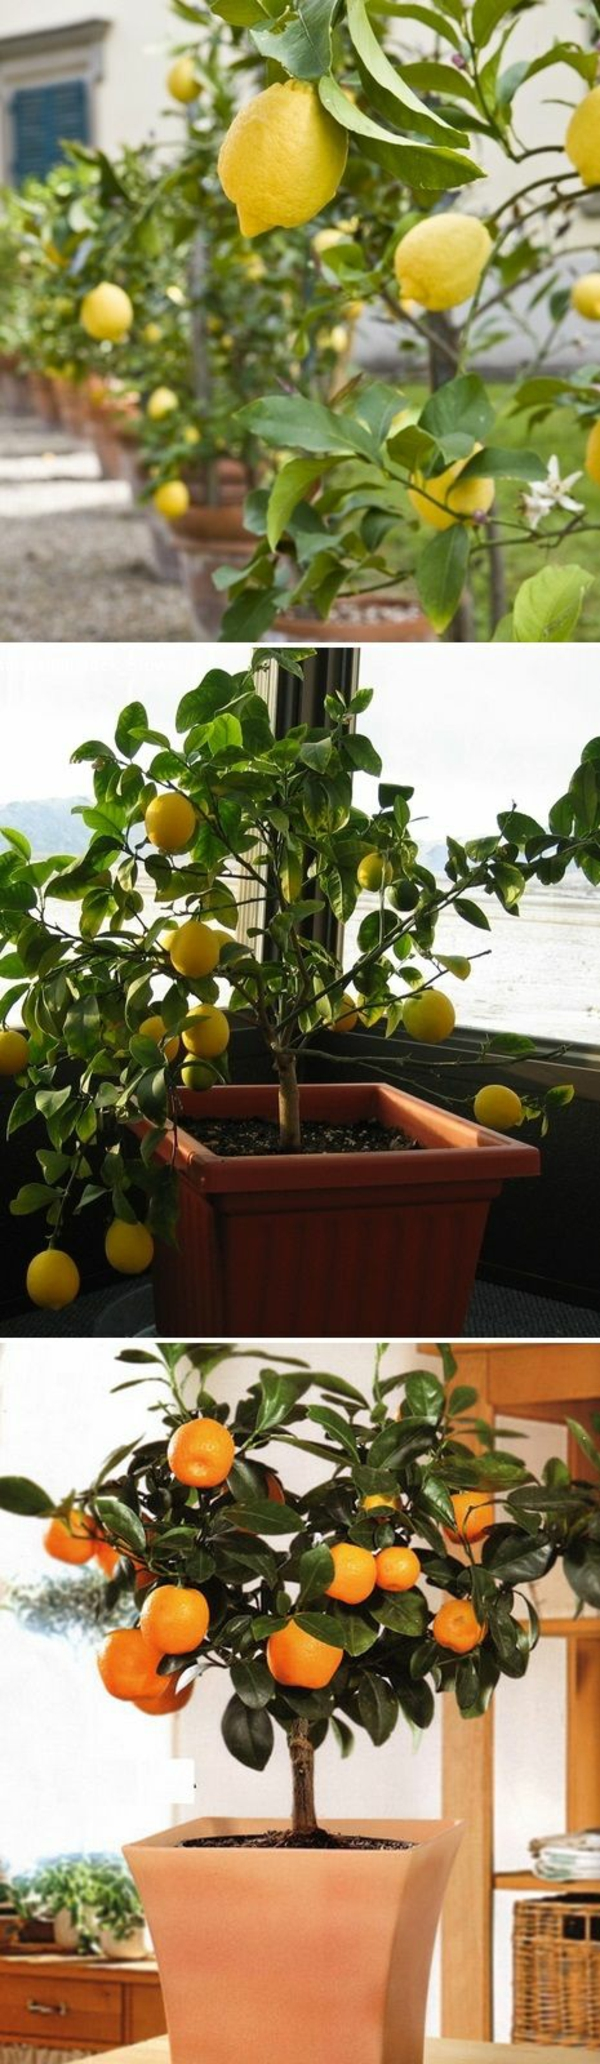 gartenideen herbst garten topfpflanzen zitronenbaum